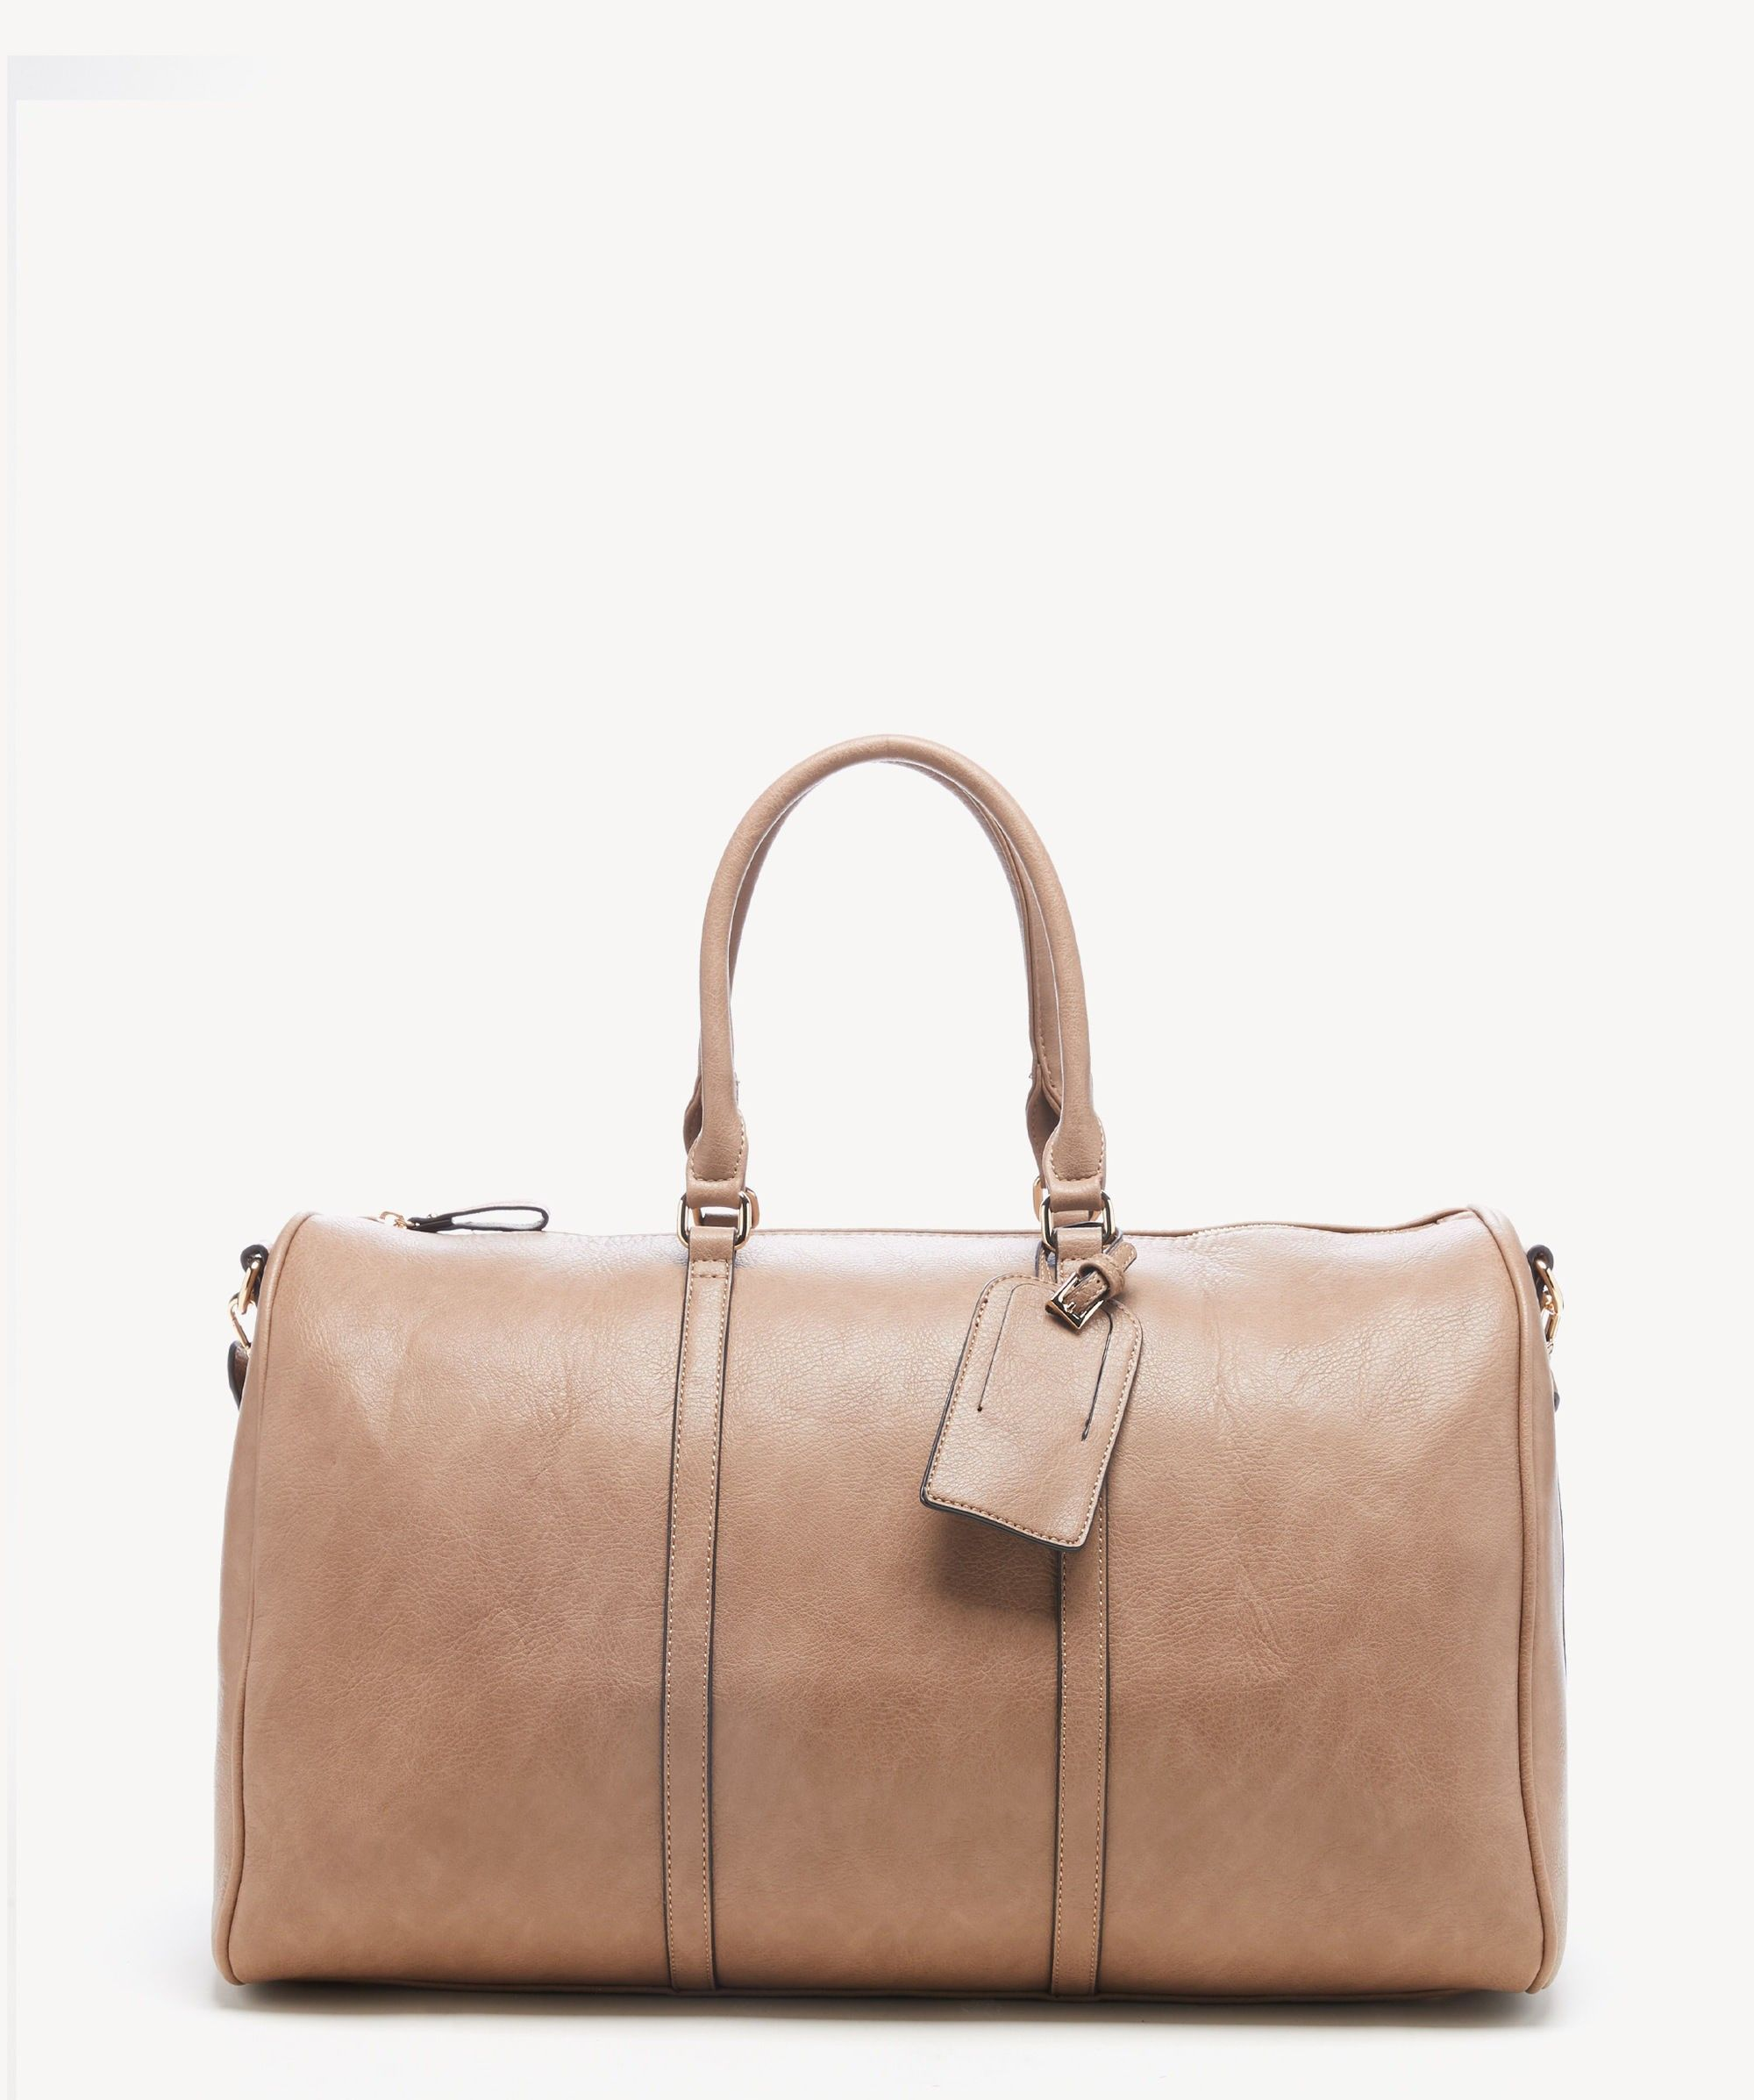 Vegan Leather Weekender The Perfect Travel Bag Vegan Leather Bag Leather Weekender Leather Duffle Bag